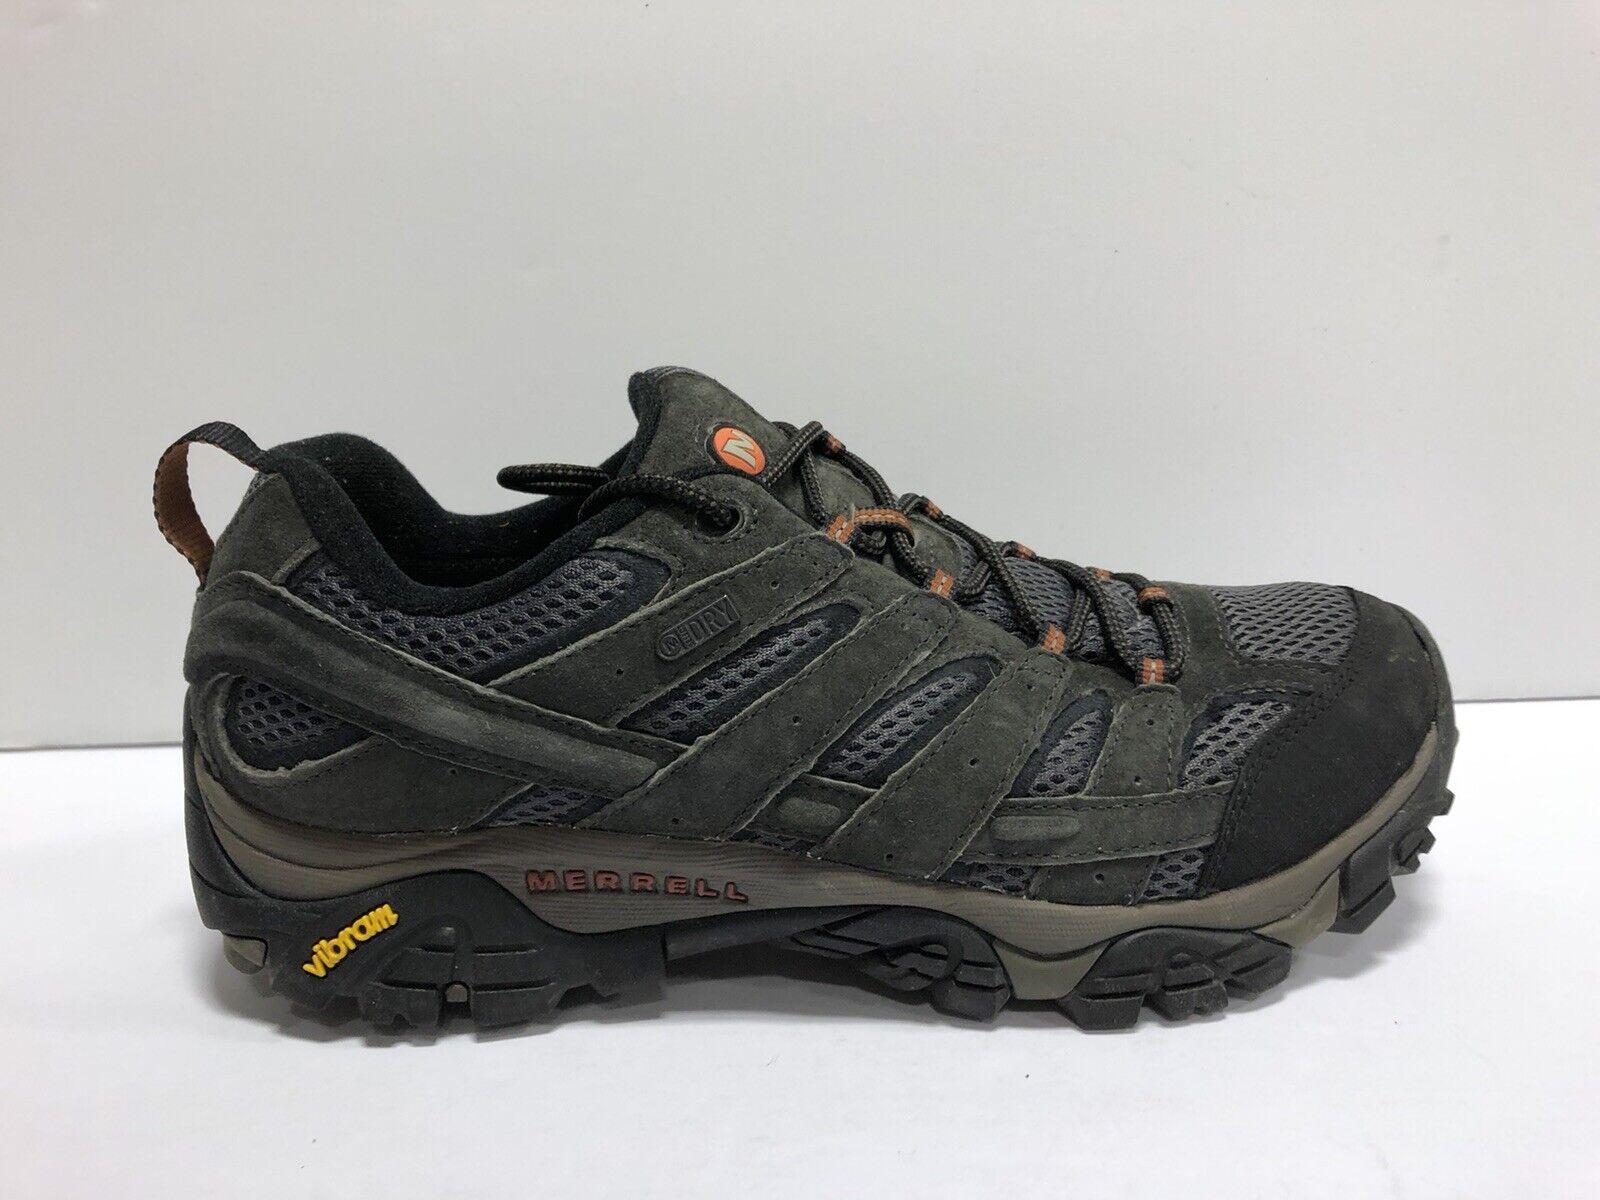 Merrell Moab 2 Waterproof Hiking Shoe Mens 10.5 M